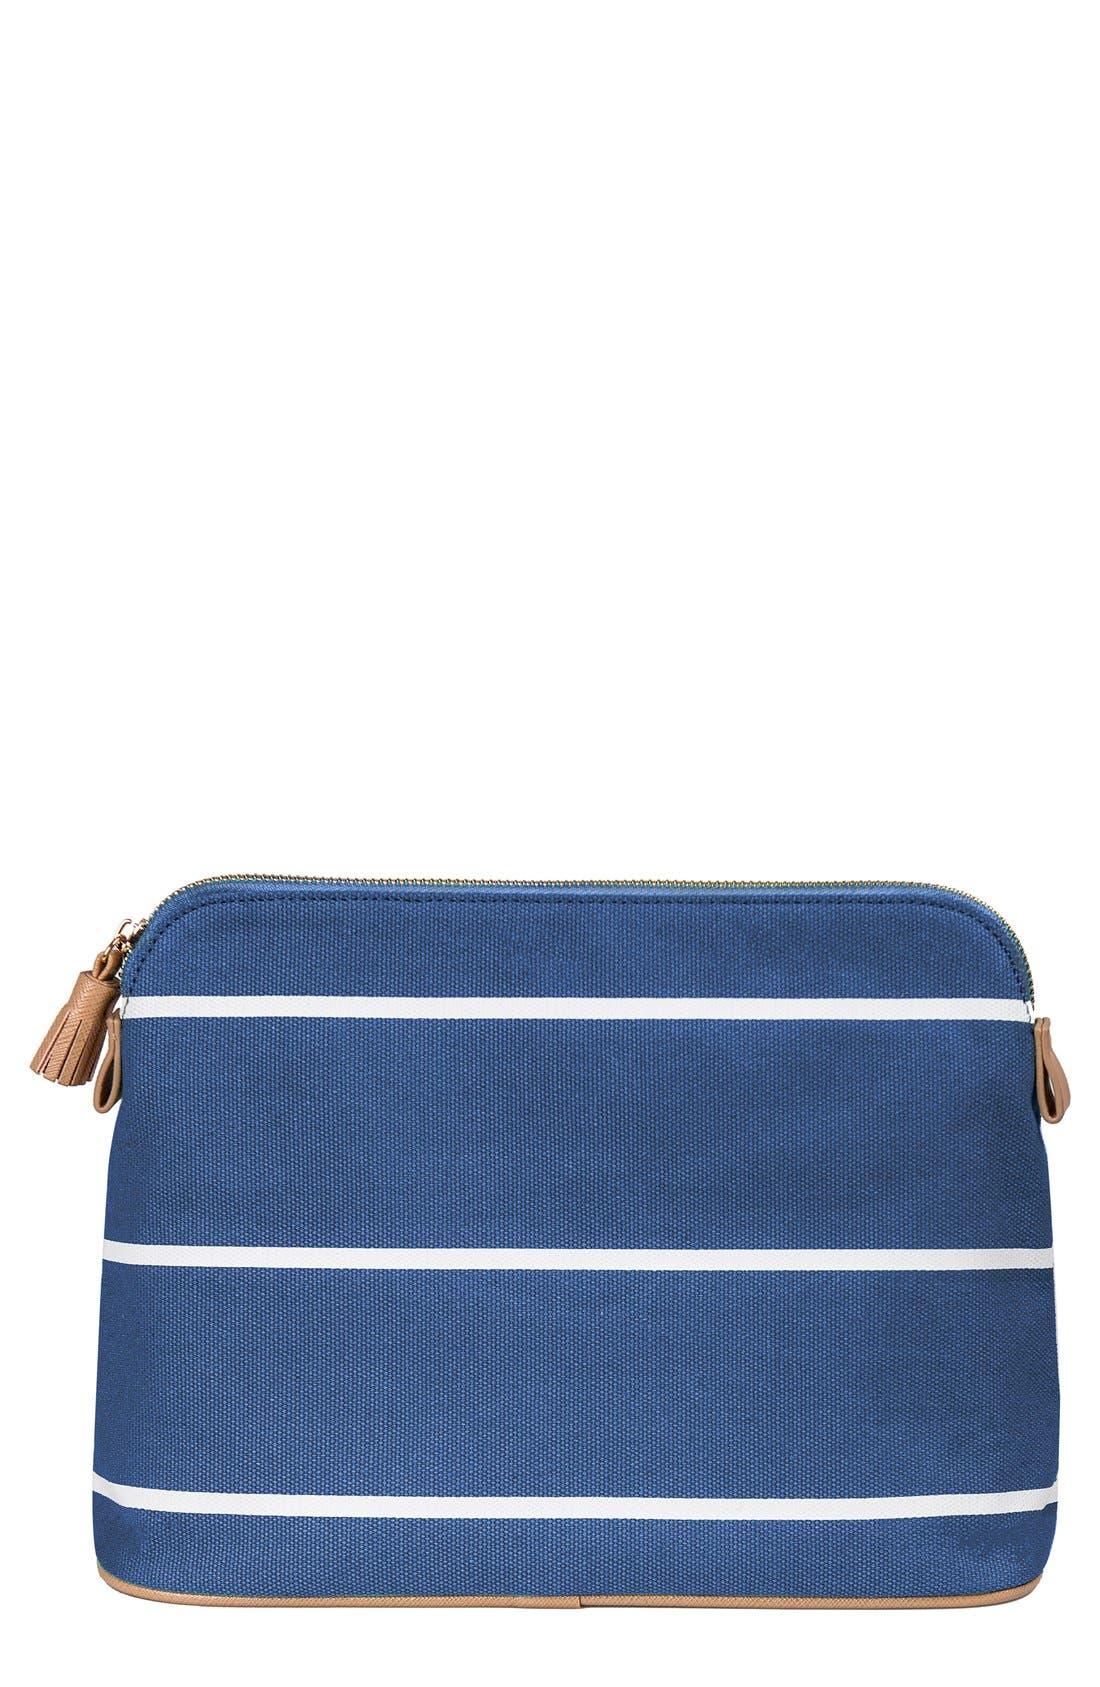 Monogram Cosmetics Bag,                             Main thumbnail 1, color,                             BLUE